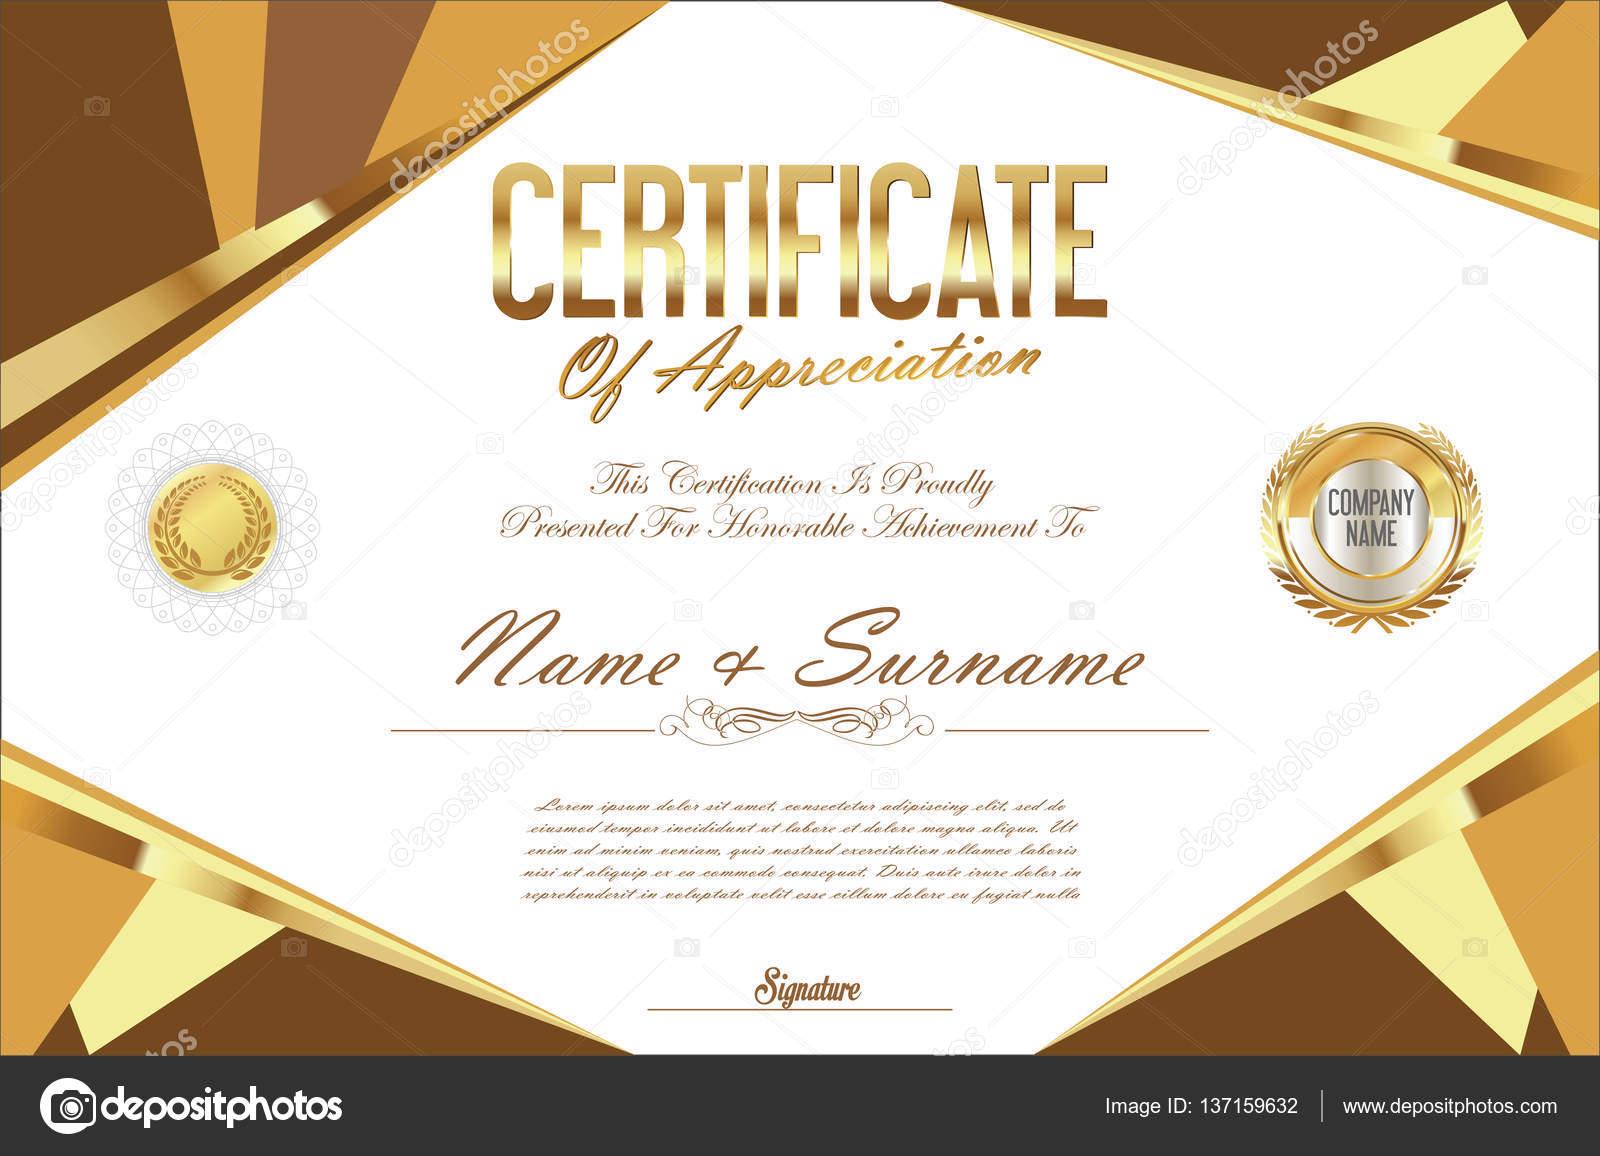 Zertifikat-Vorlage-retro-design — Stockvektor © totallyout #137159632